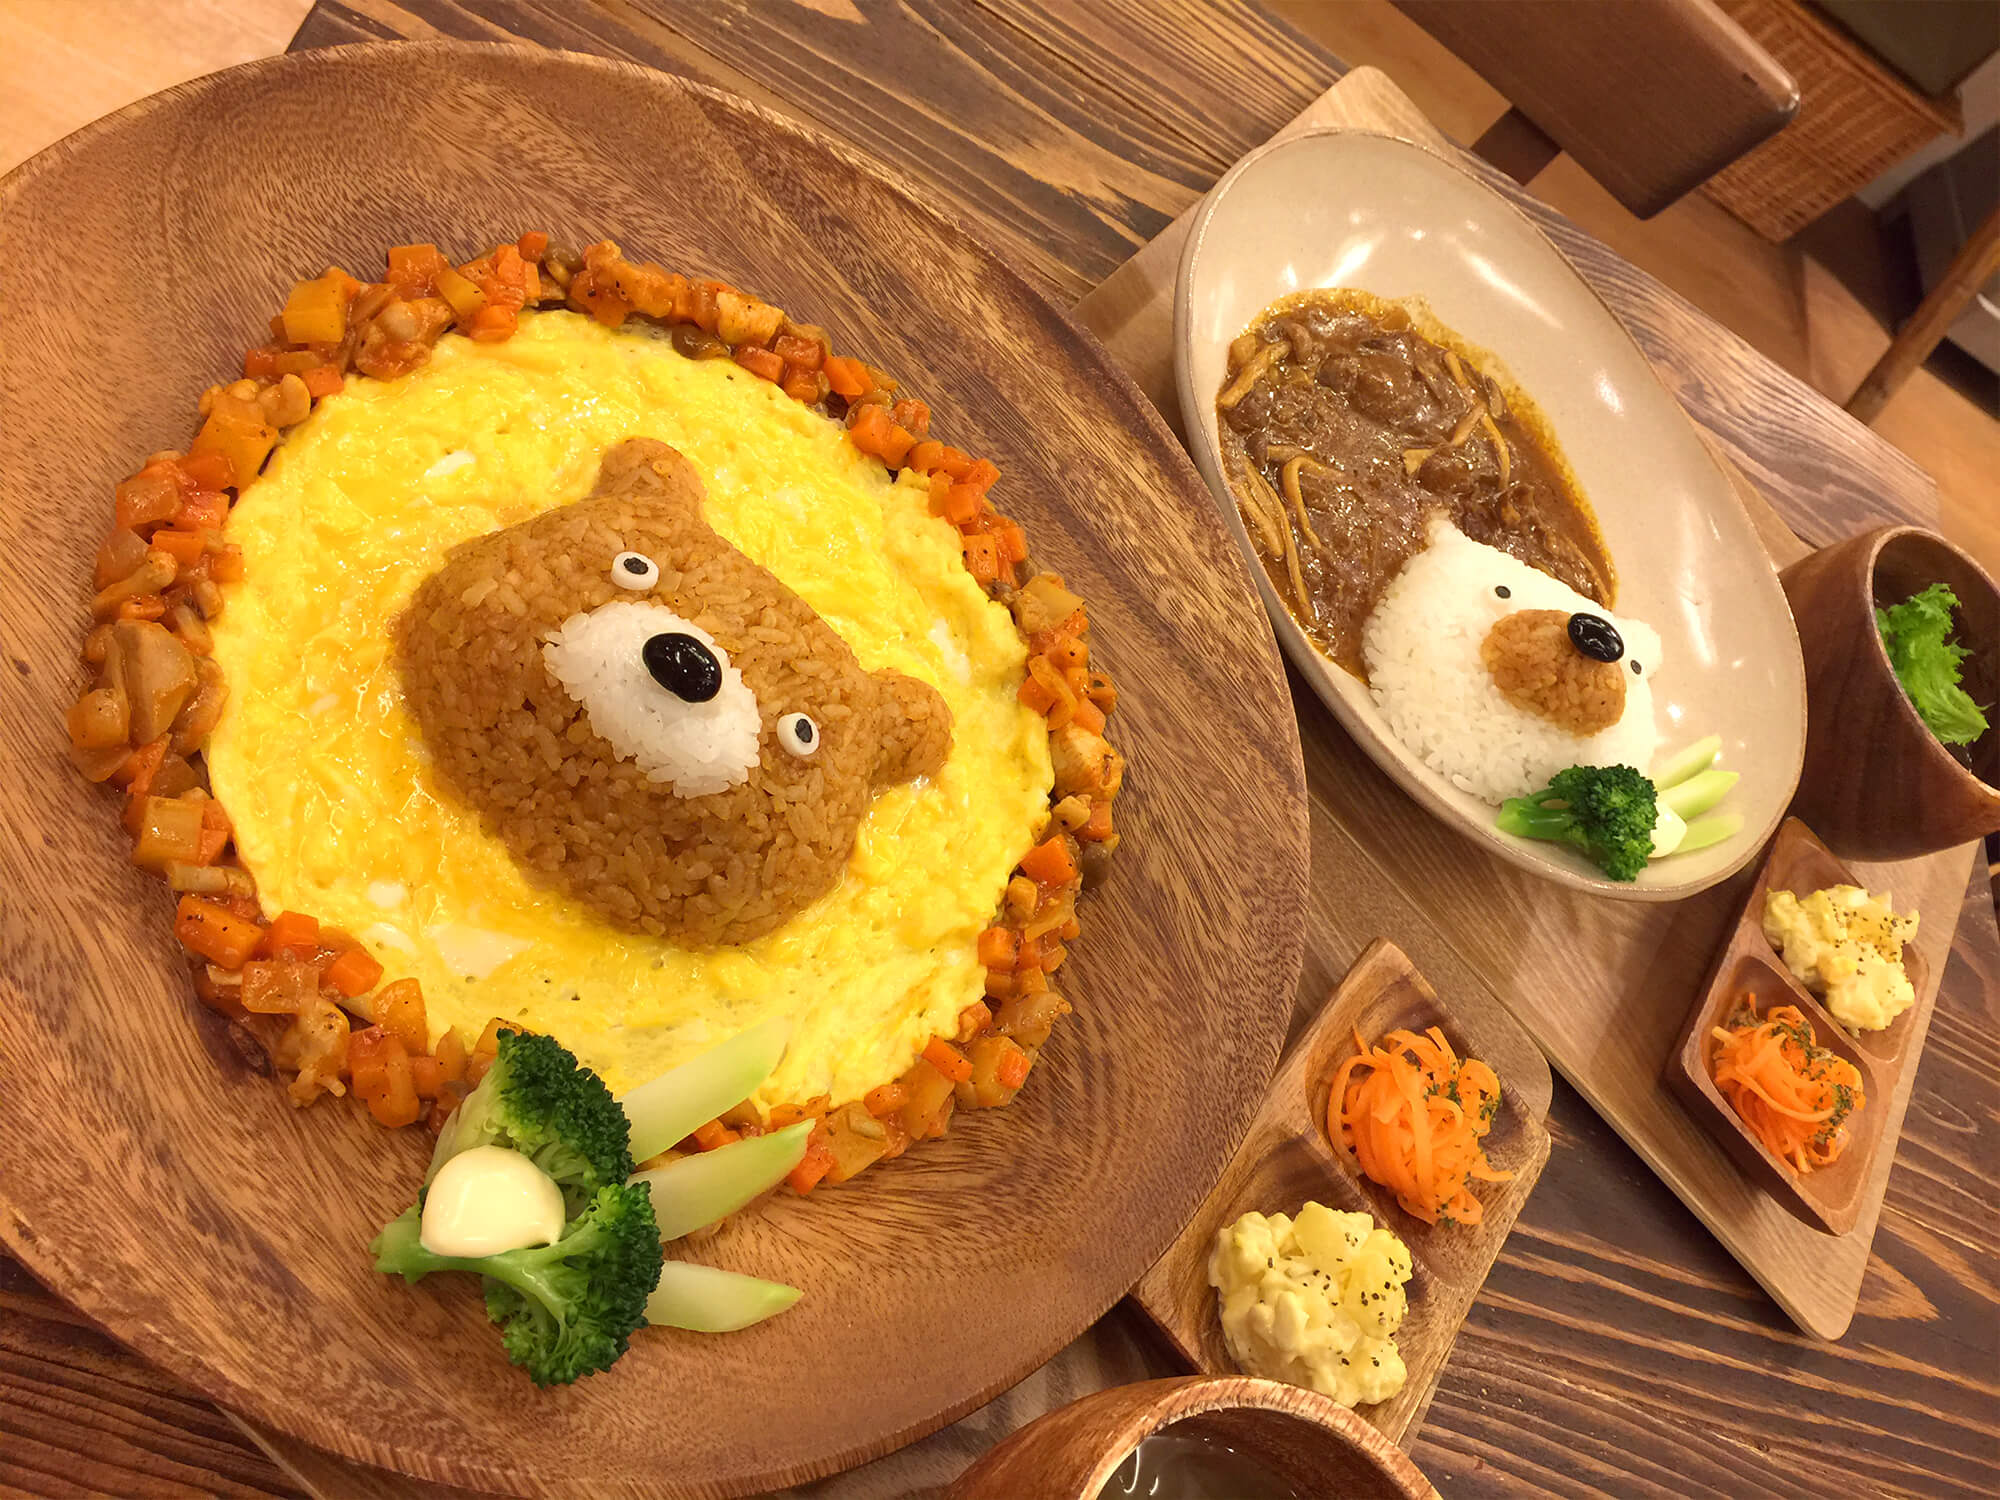 henteco(へんてこ)~森の洋菓子店左から:くまライスと白くまビーフストロガノフ/¥1200円(税抜き)